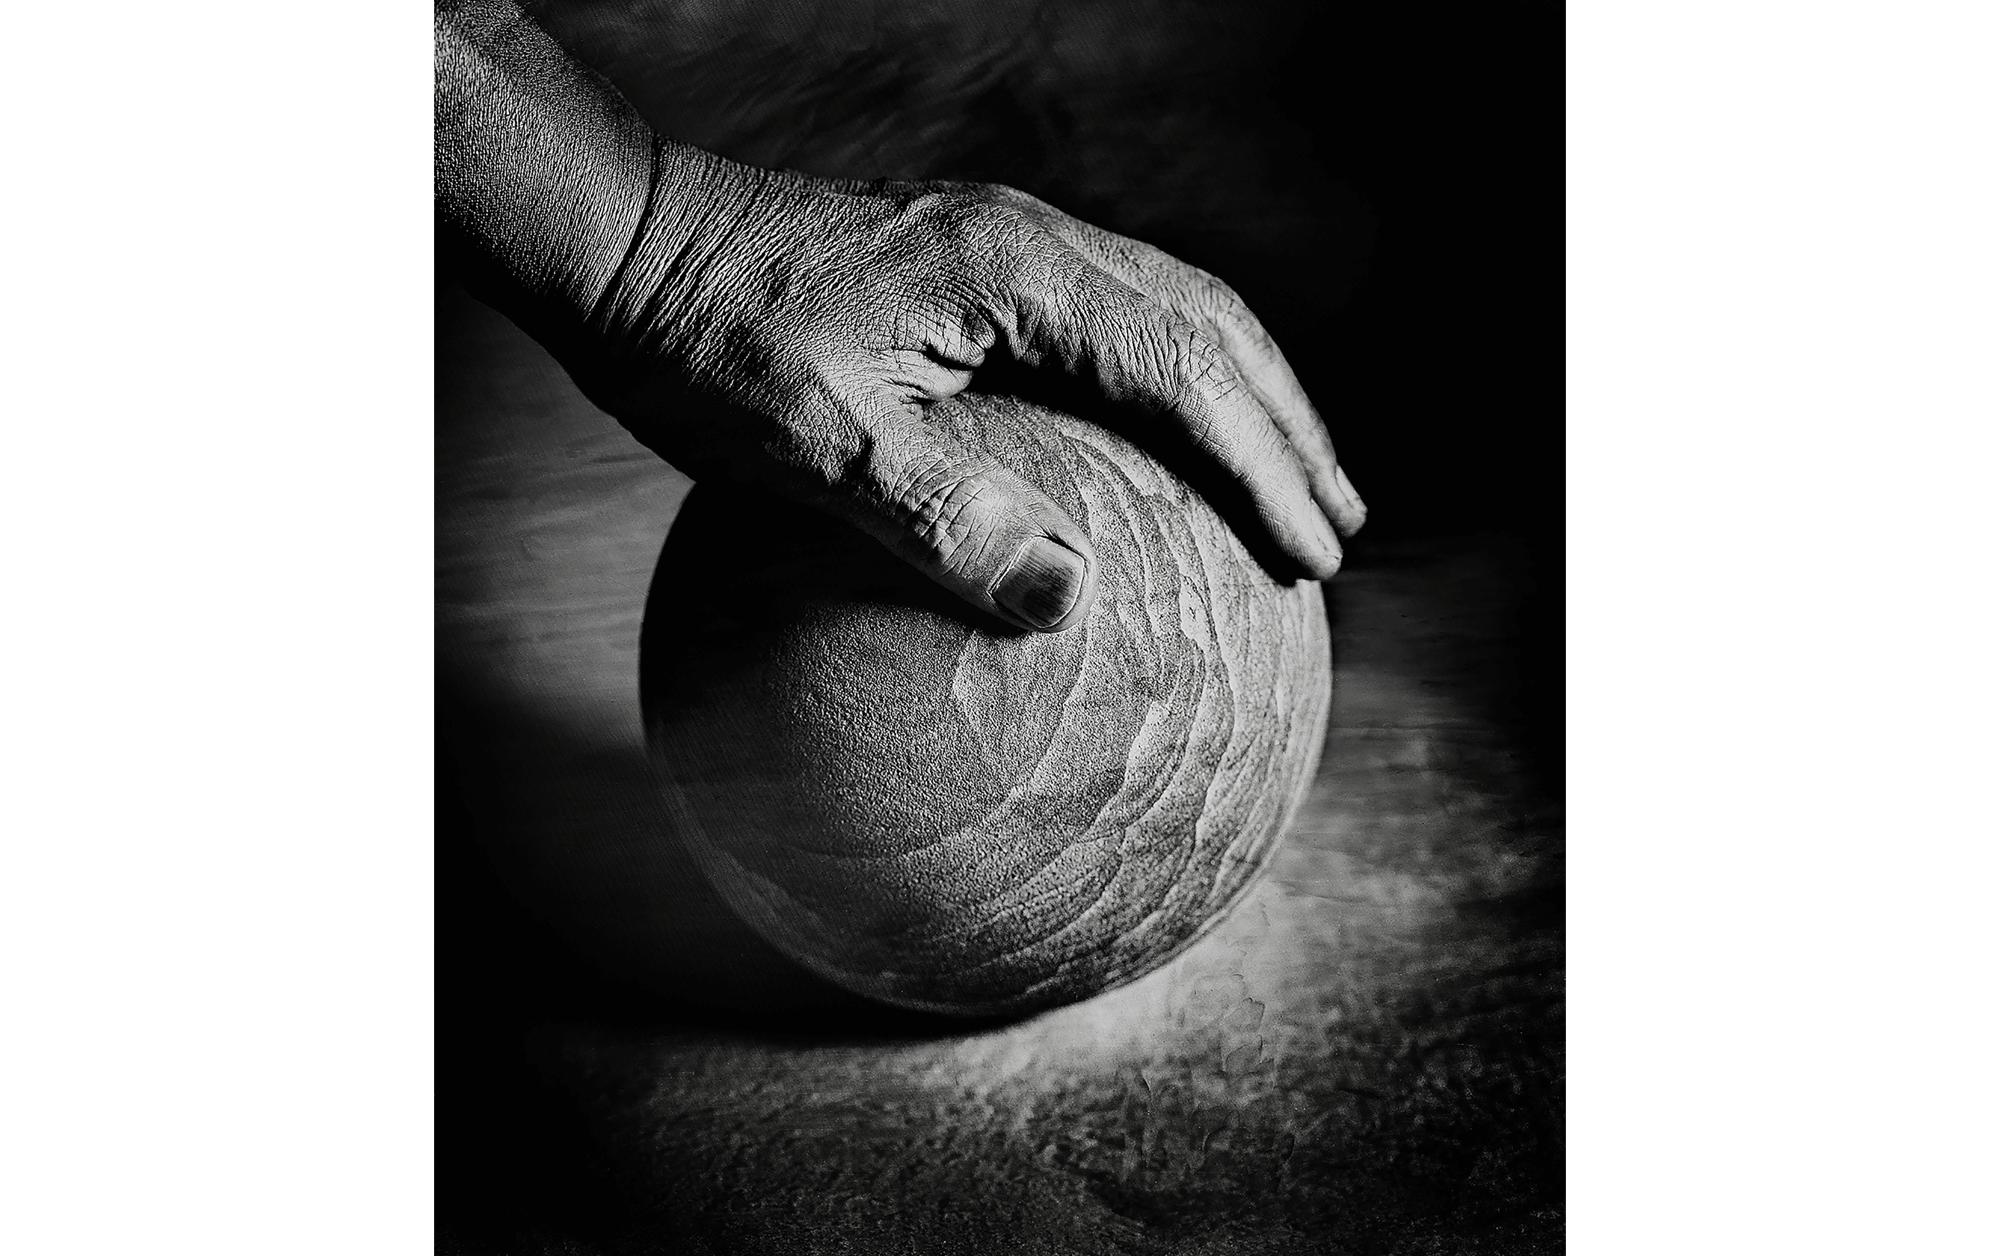 """Self portrait my hand"", 2002 © Shin Sugino"